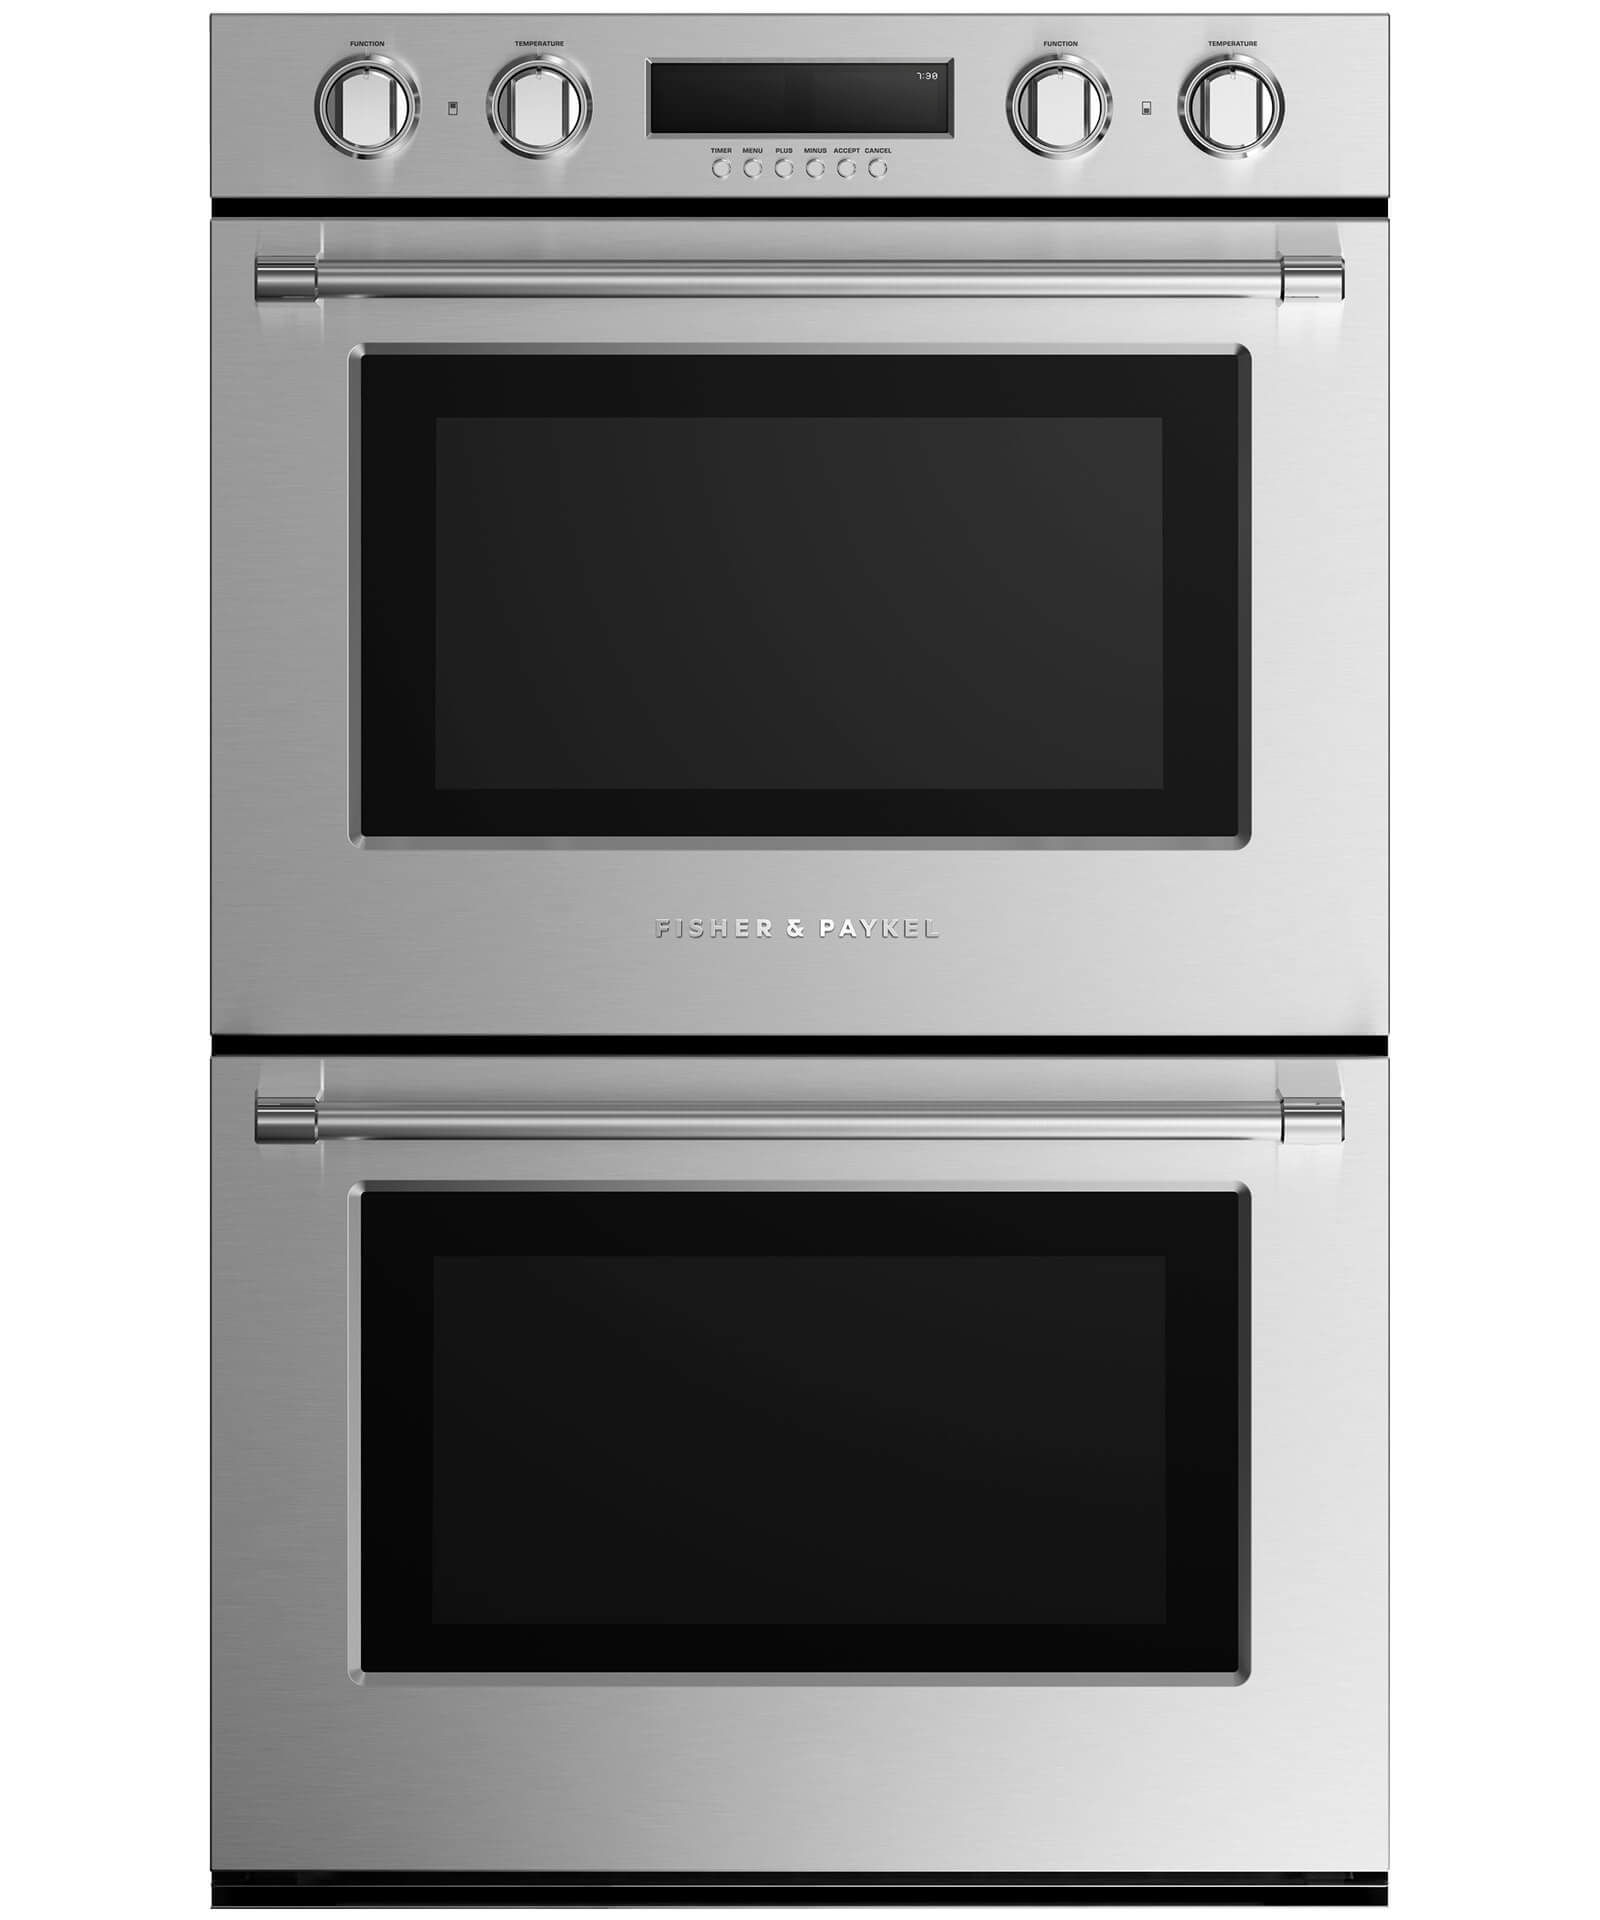 Double Built-in Oven 30